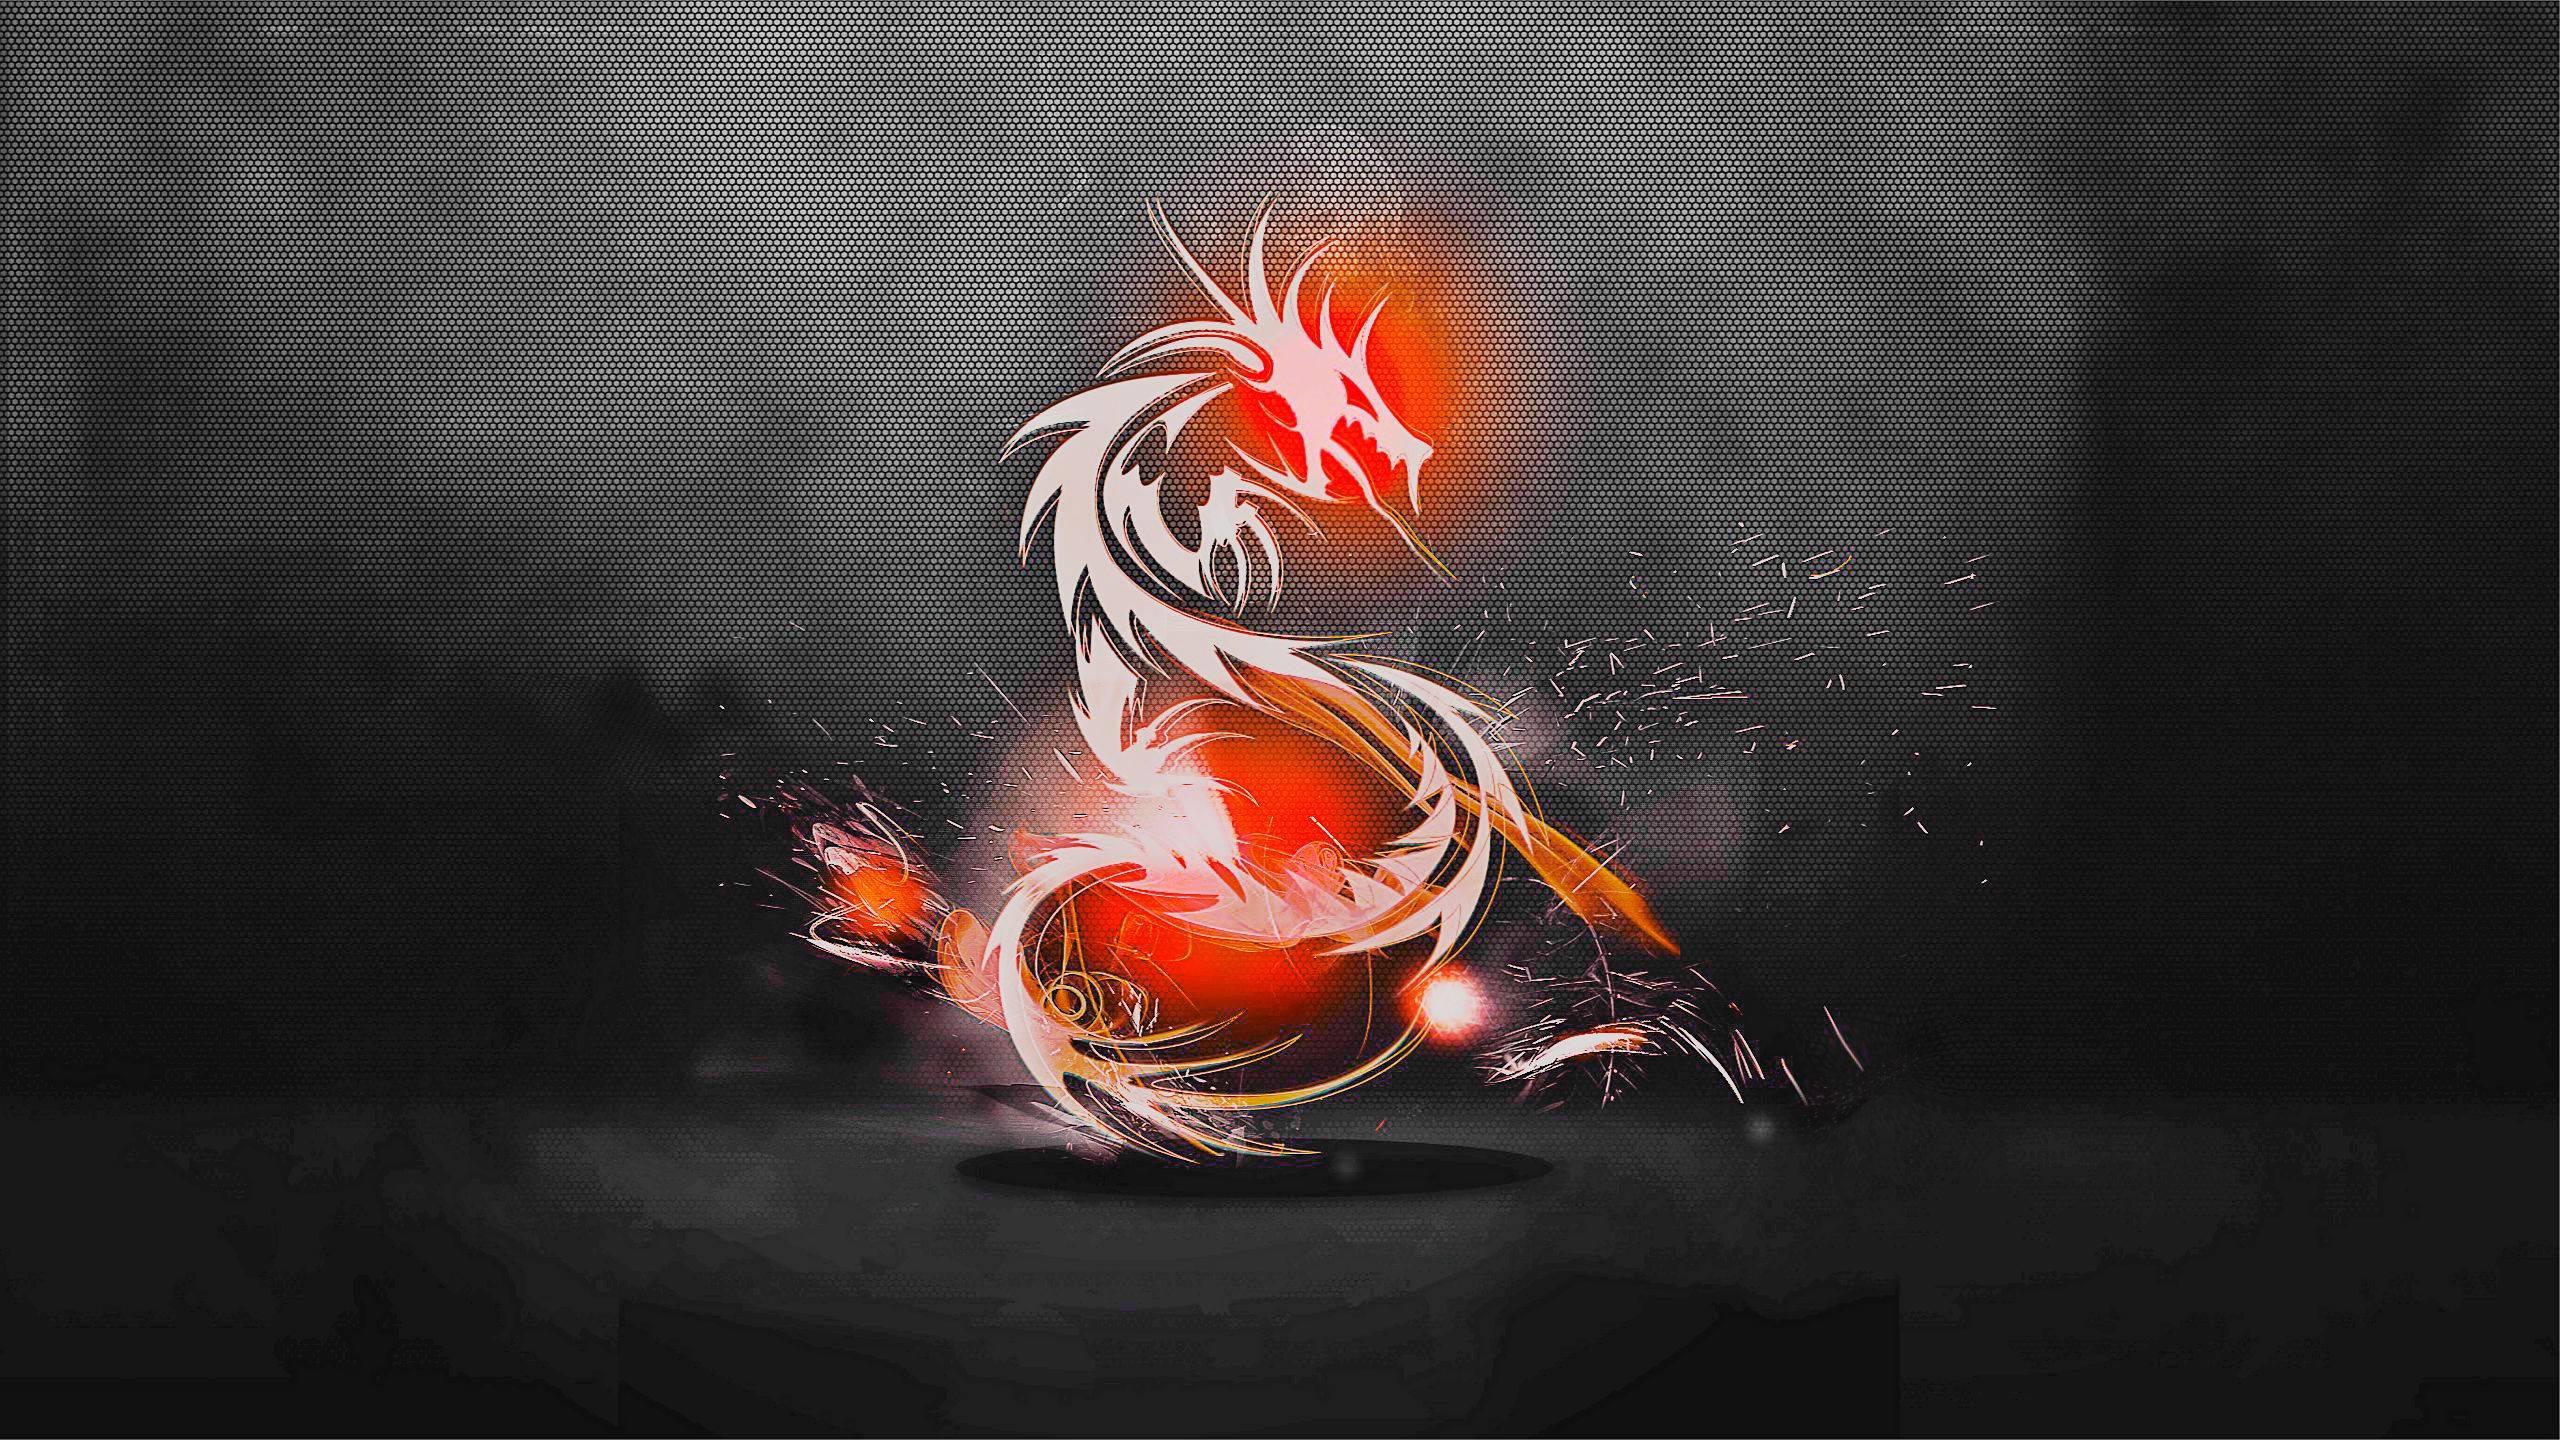 Abstract Dragon Wallpapers Top Free Abstract Dragon